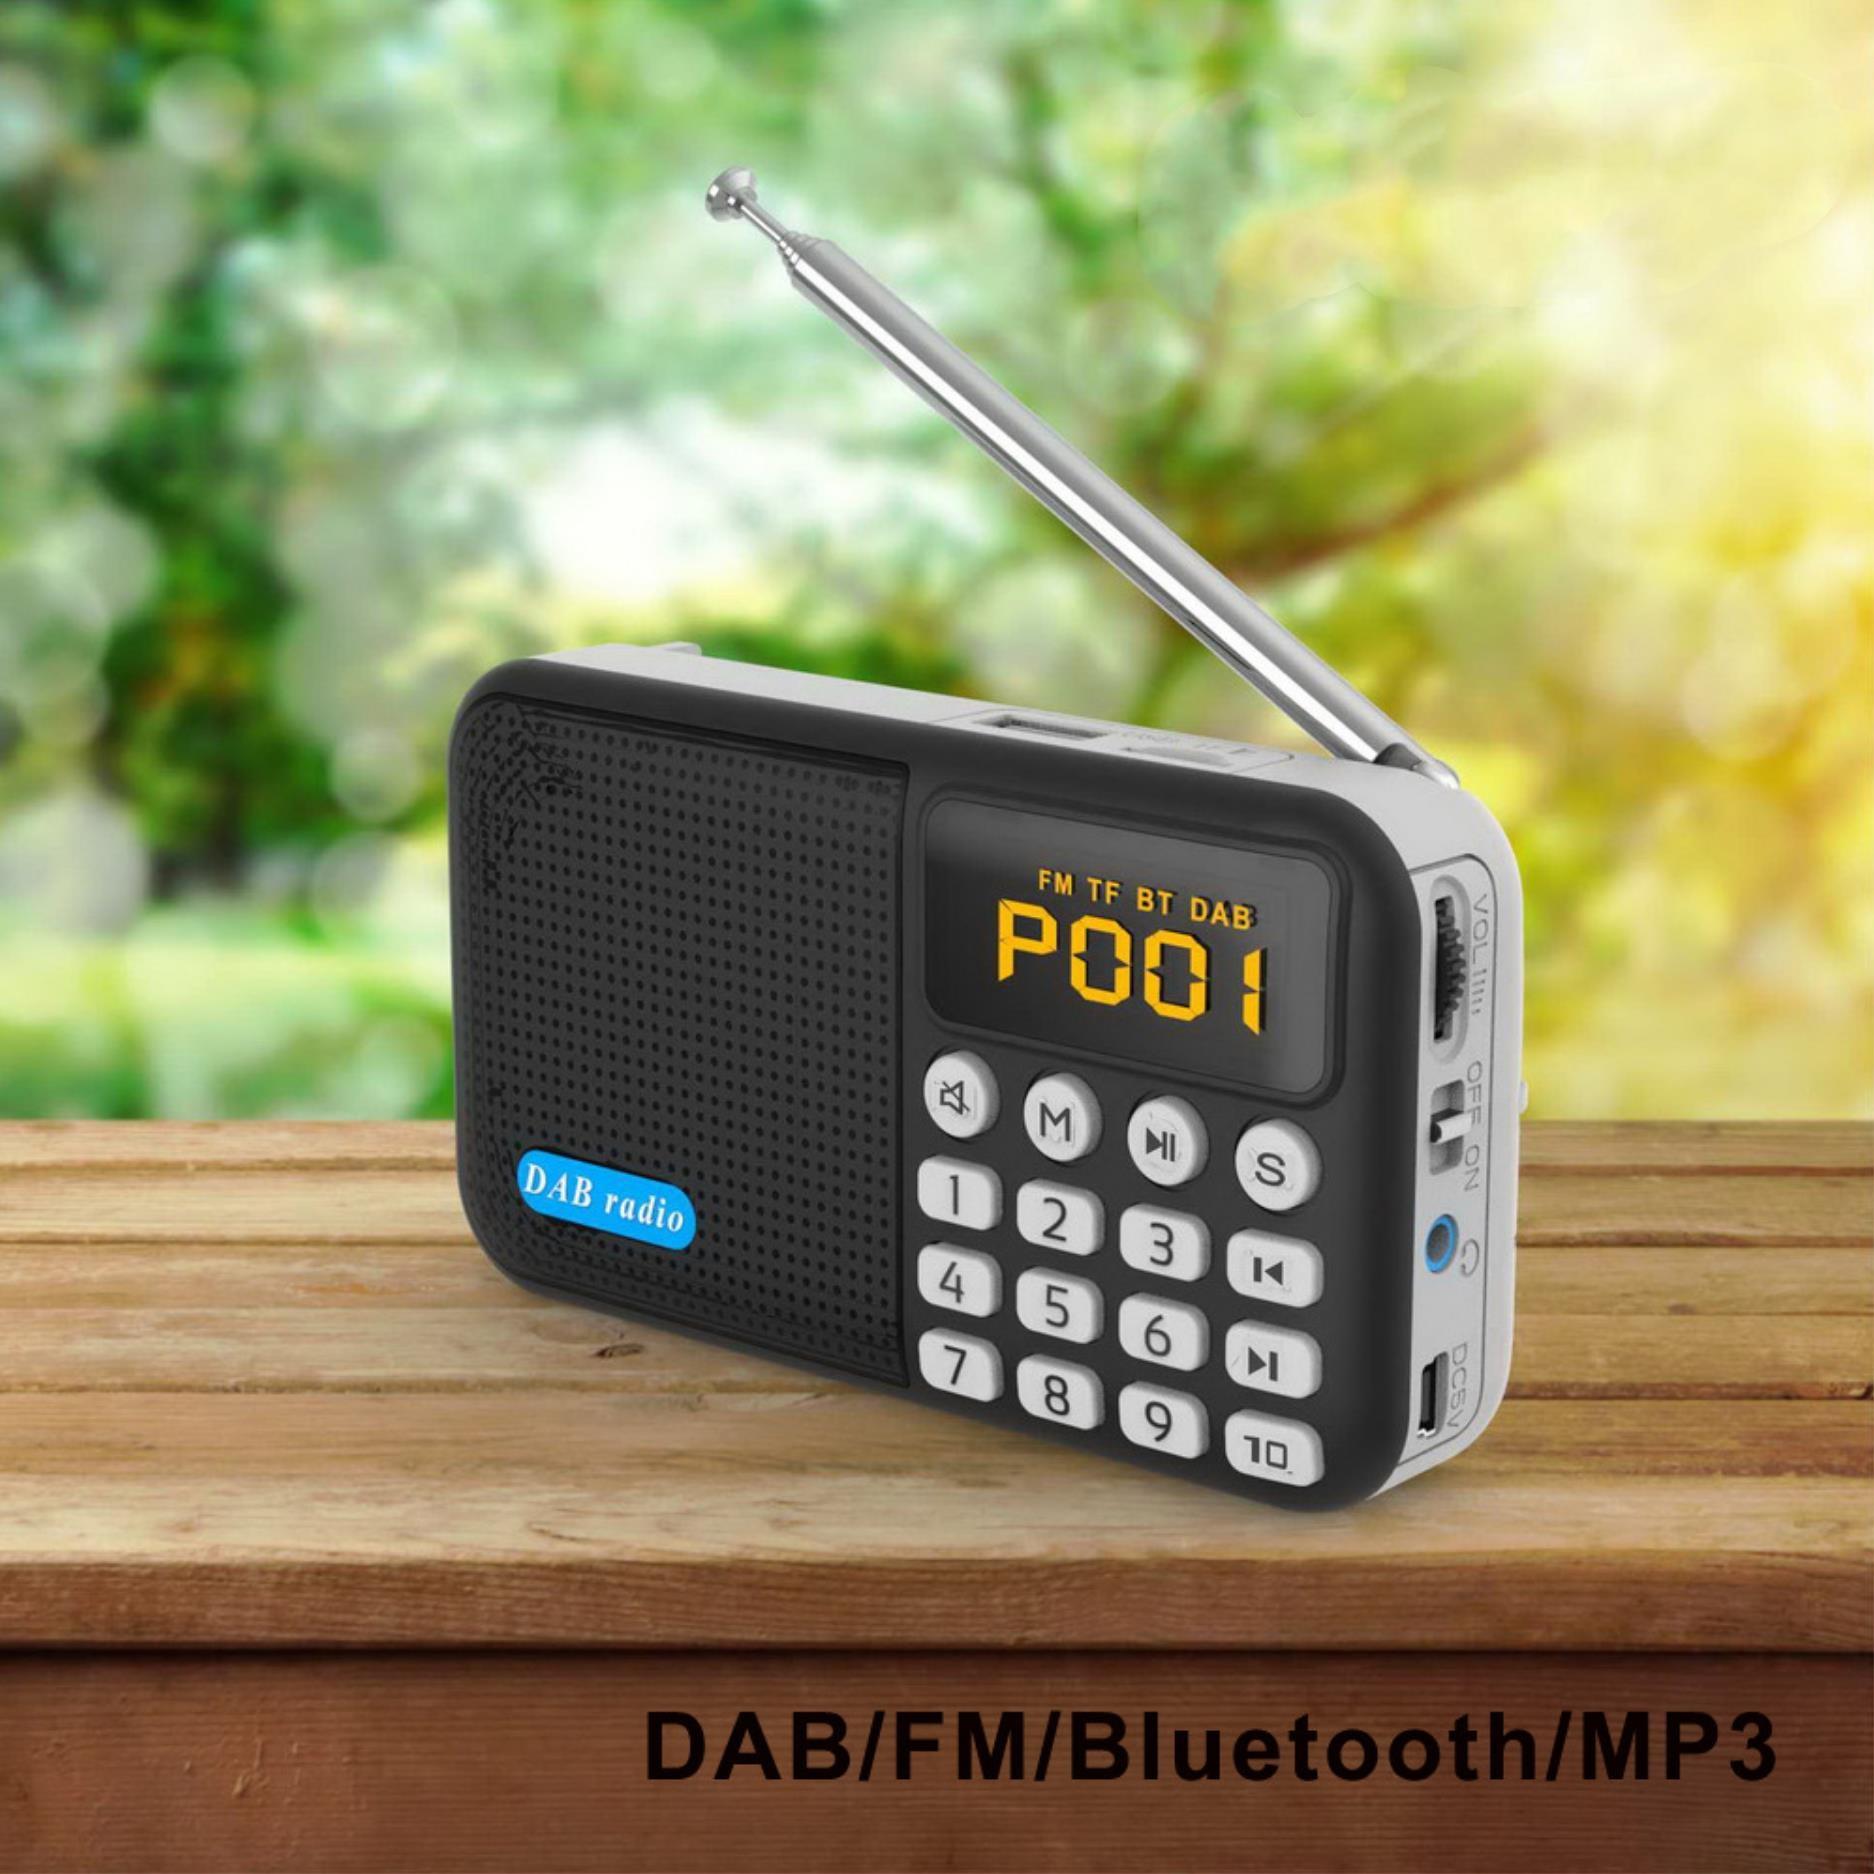 Multifuncional portátil radio digital DAB portátil DAB radio Bluetooth MP3